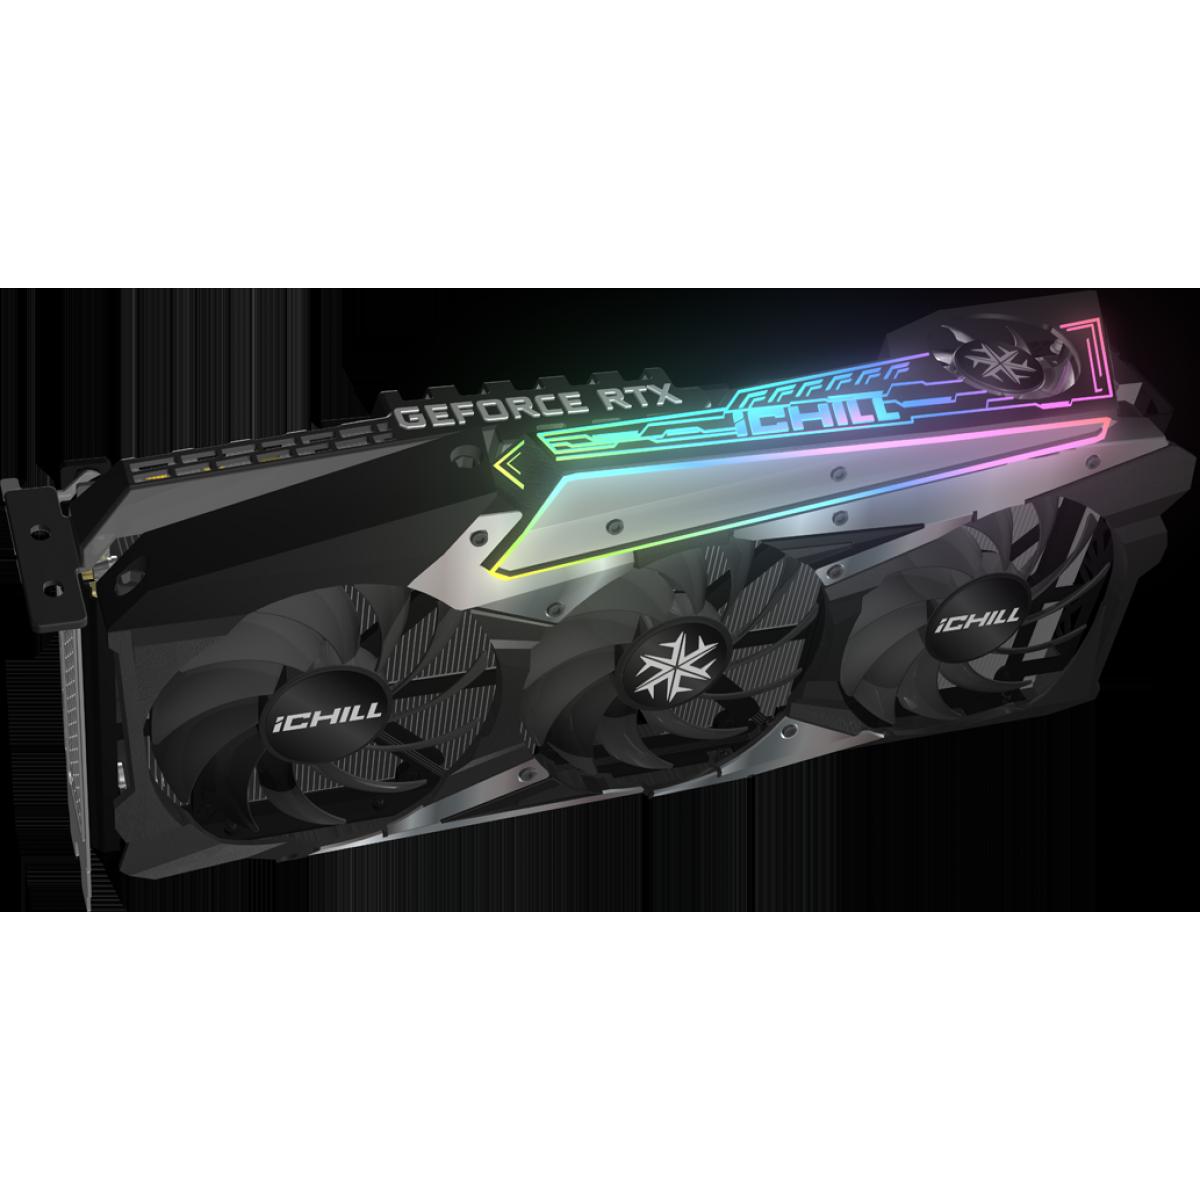 Placa de Vídeo INNO3D Geforce, ICHILL X4, RTX 3090, 24GB, GDDR6X, 384bit, C30904-246XX-1880VA36